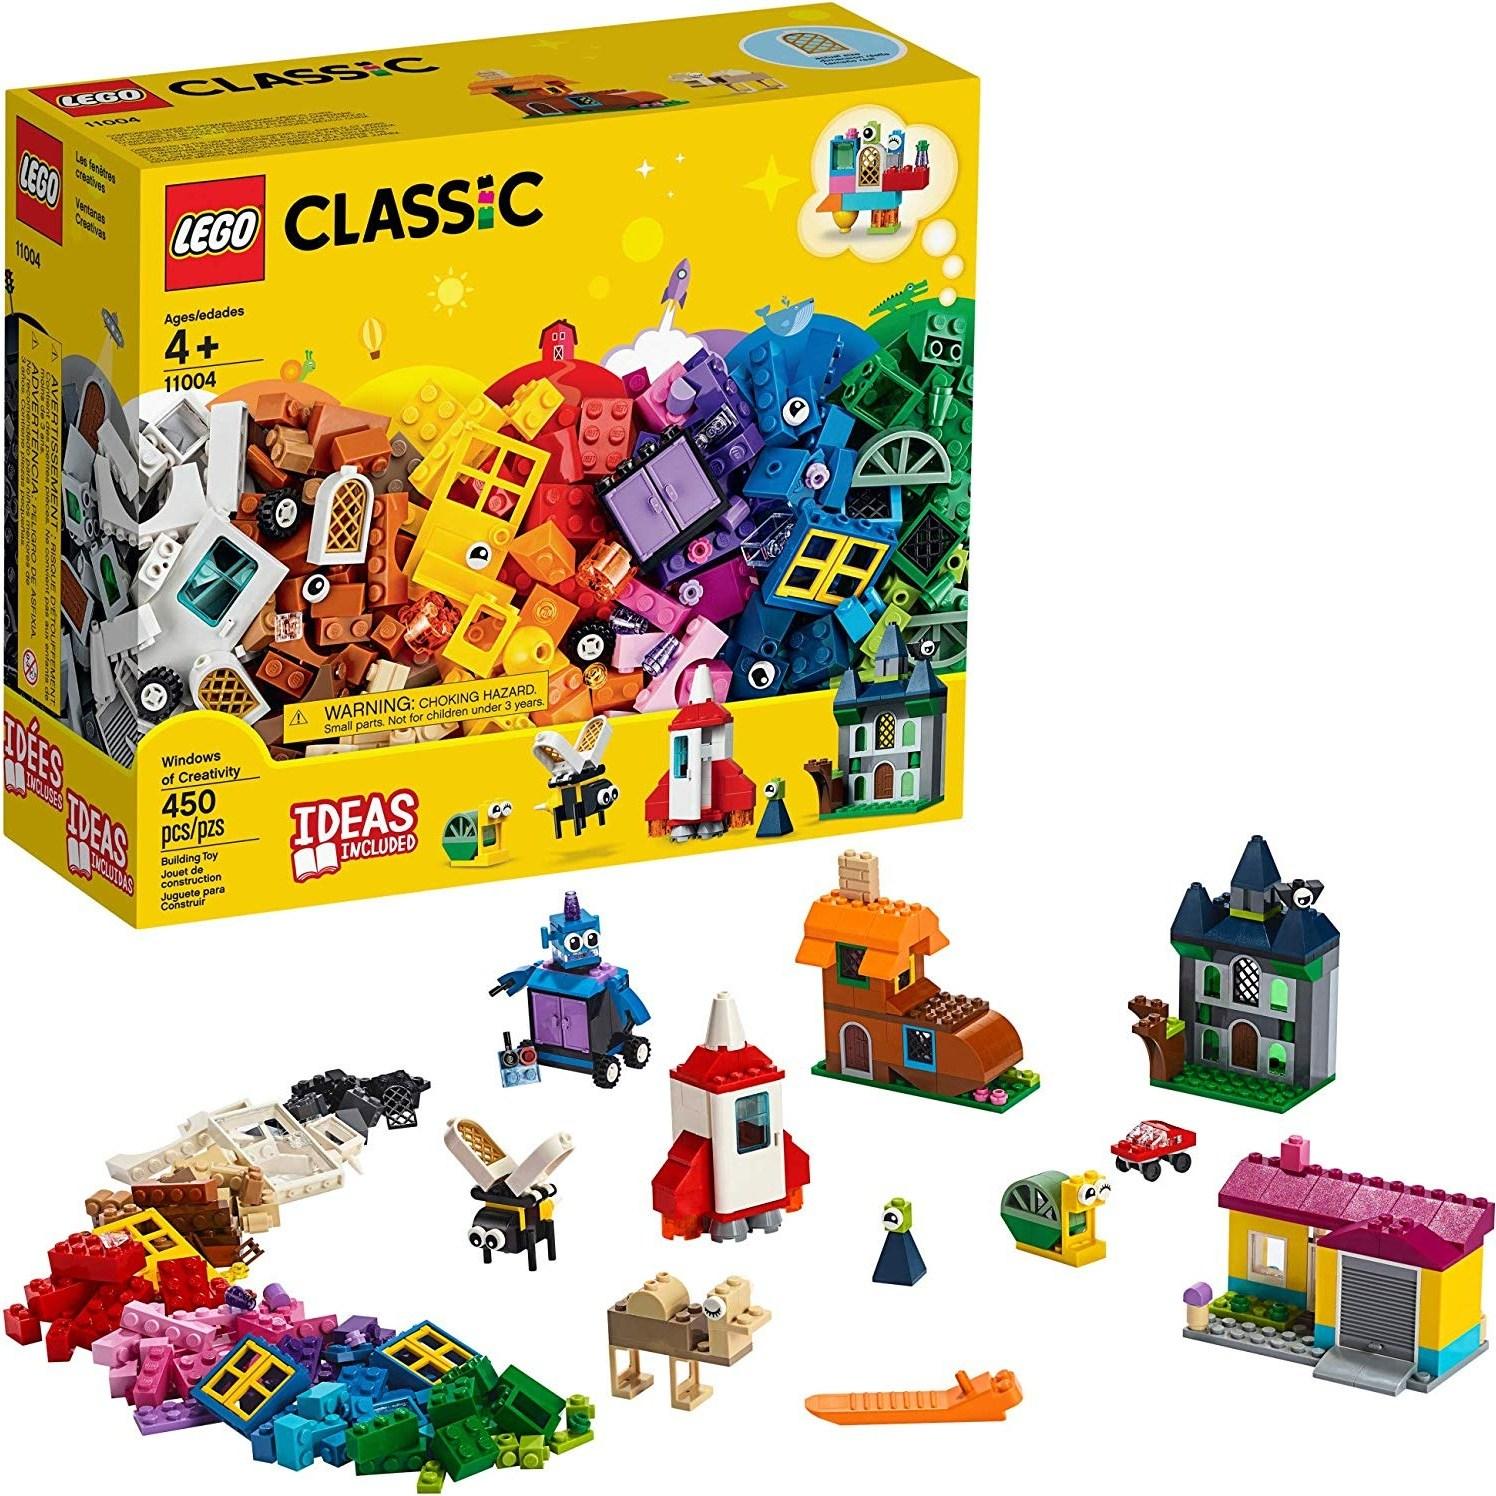 LEGO 레고 클래식 창의력의 창문 450 피스 11004, 단일제품